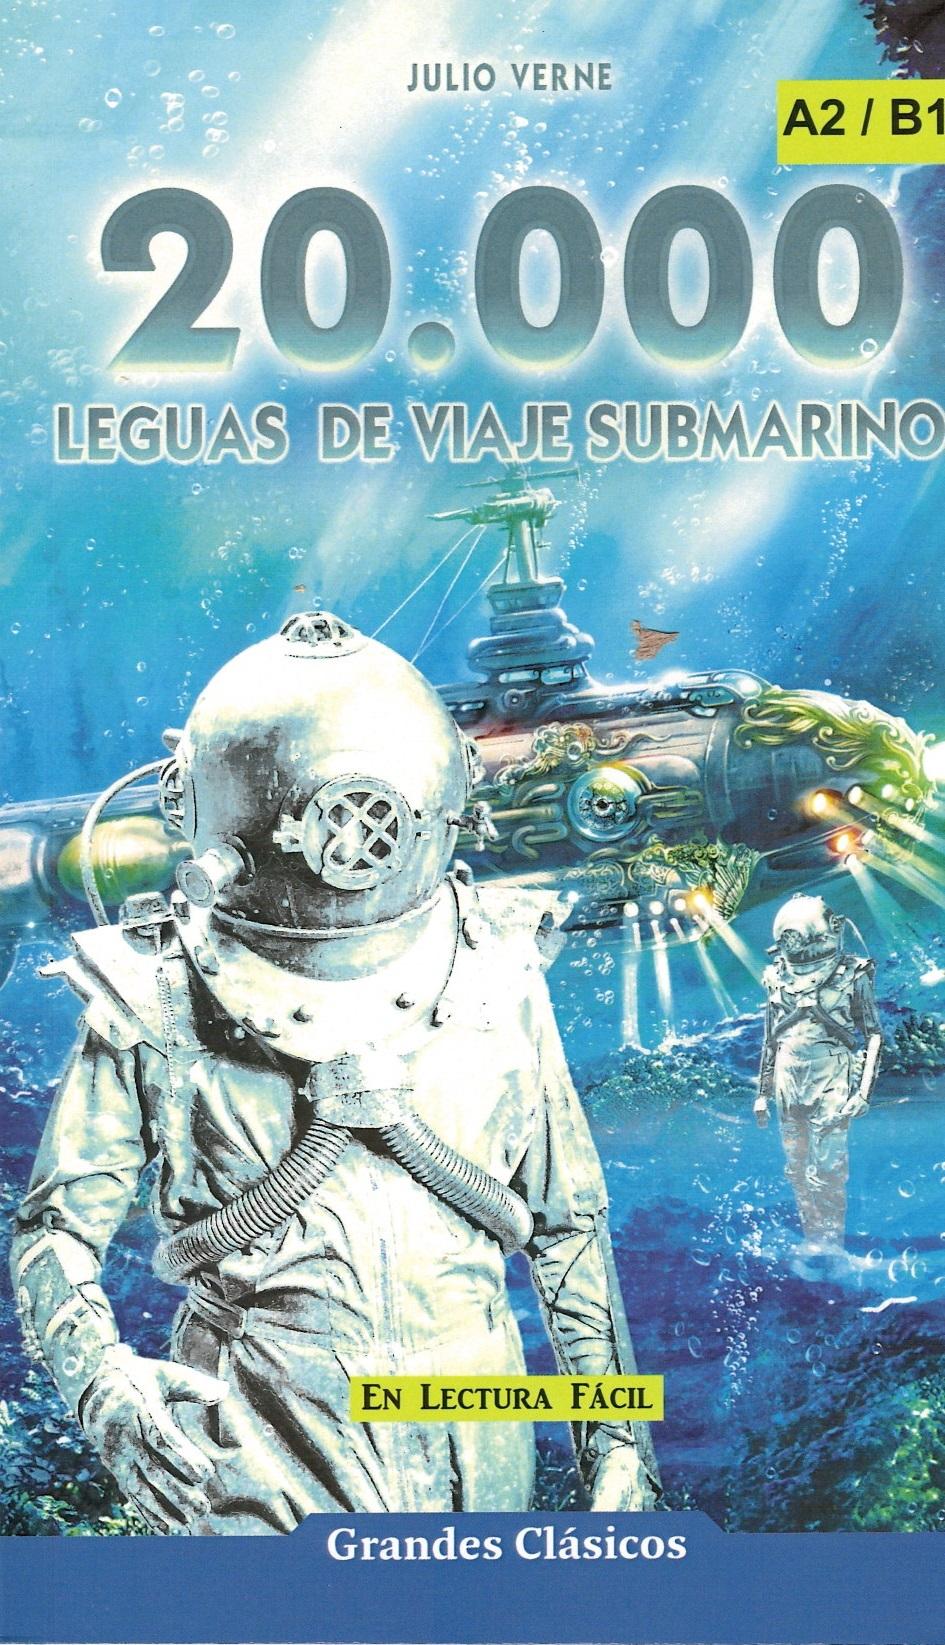 Lectura fácil 20.000 leguas de viaje submarino